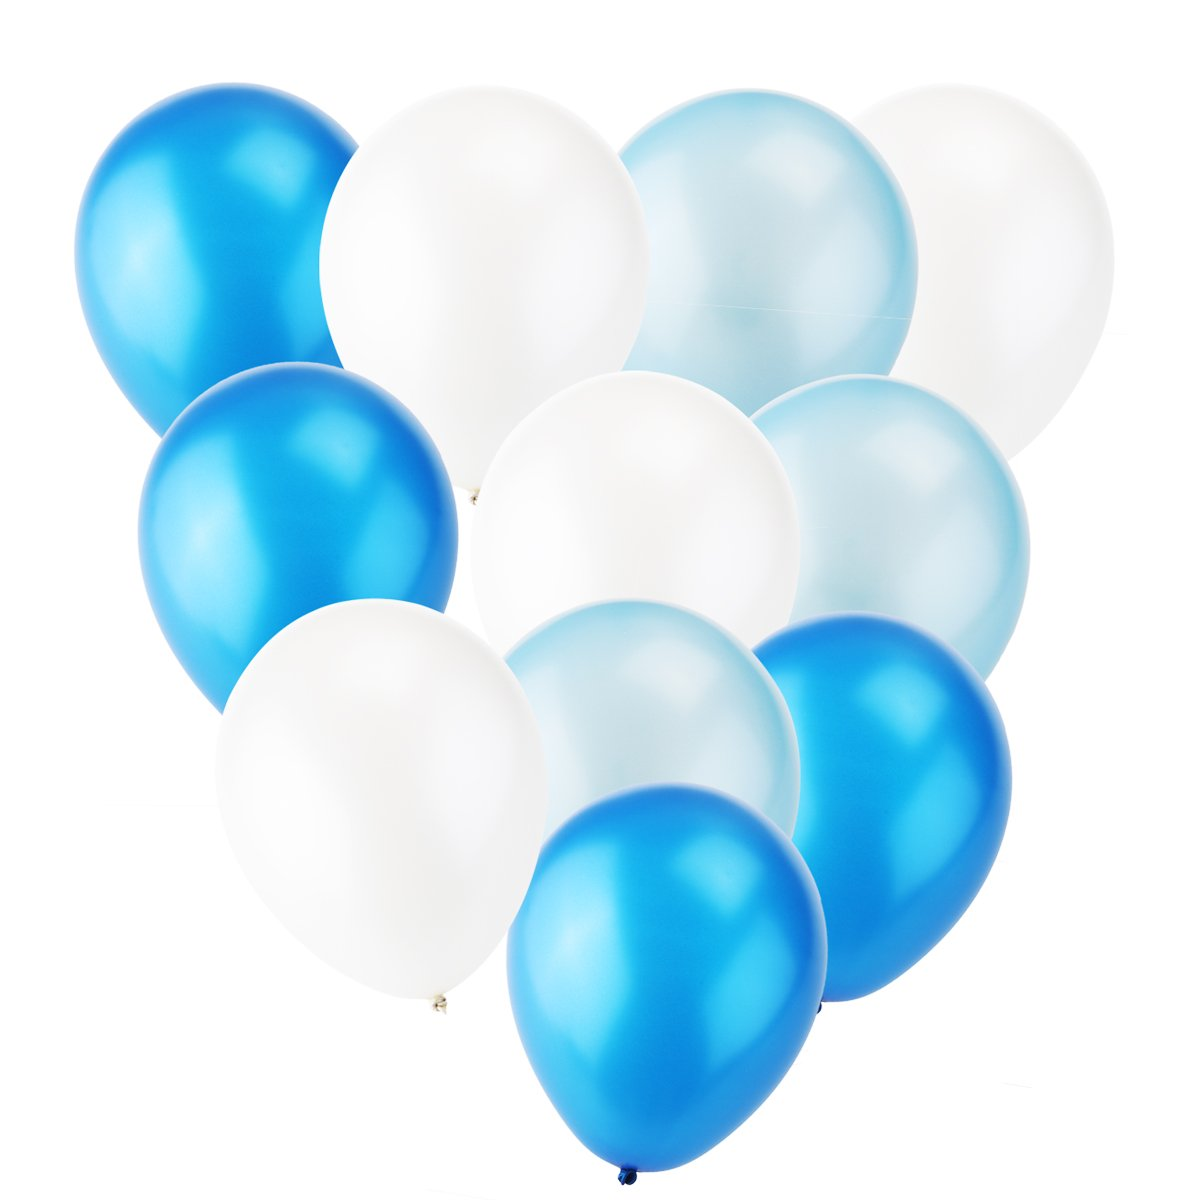 Navy Blue * Azul * blanco NUOLUX 30pcs 12 pulgadas perla l/átex globos para fiesta de cumplea/ños de la novia